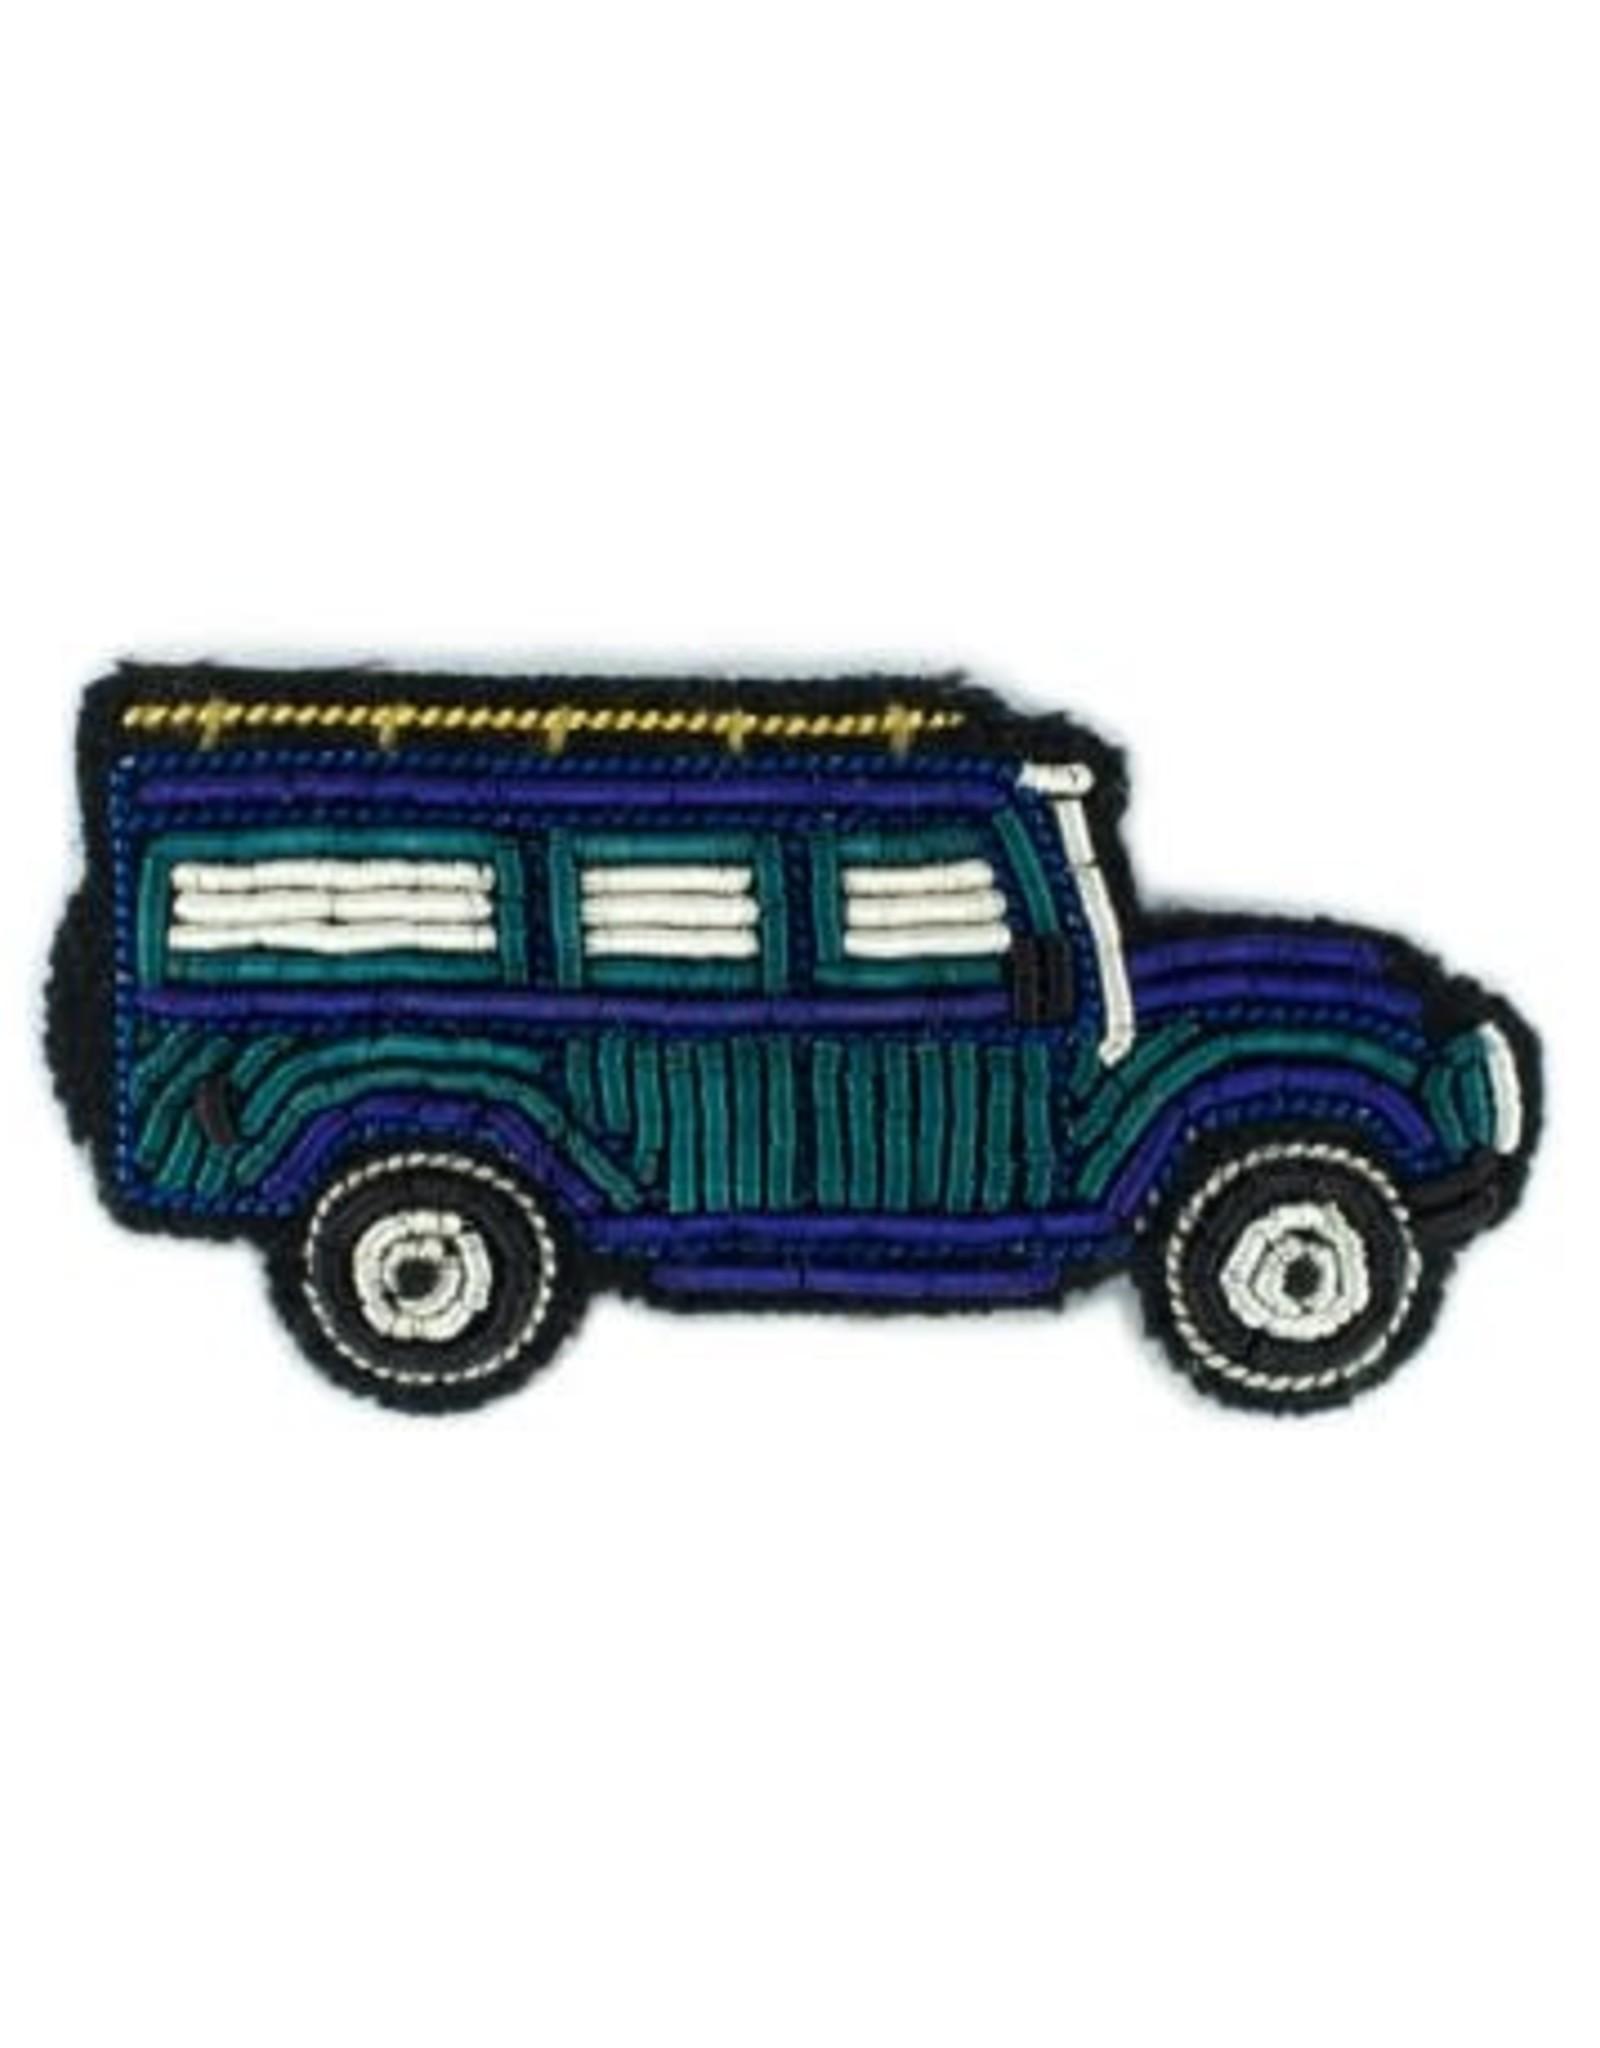 Macon&Lesquoy Broche - Jeep - Macon & Lesquoy